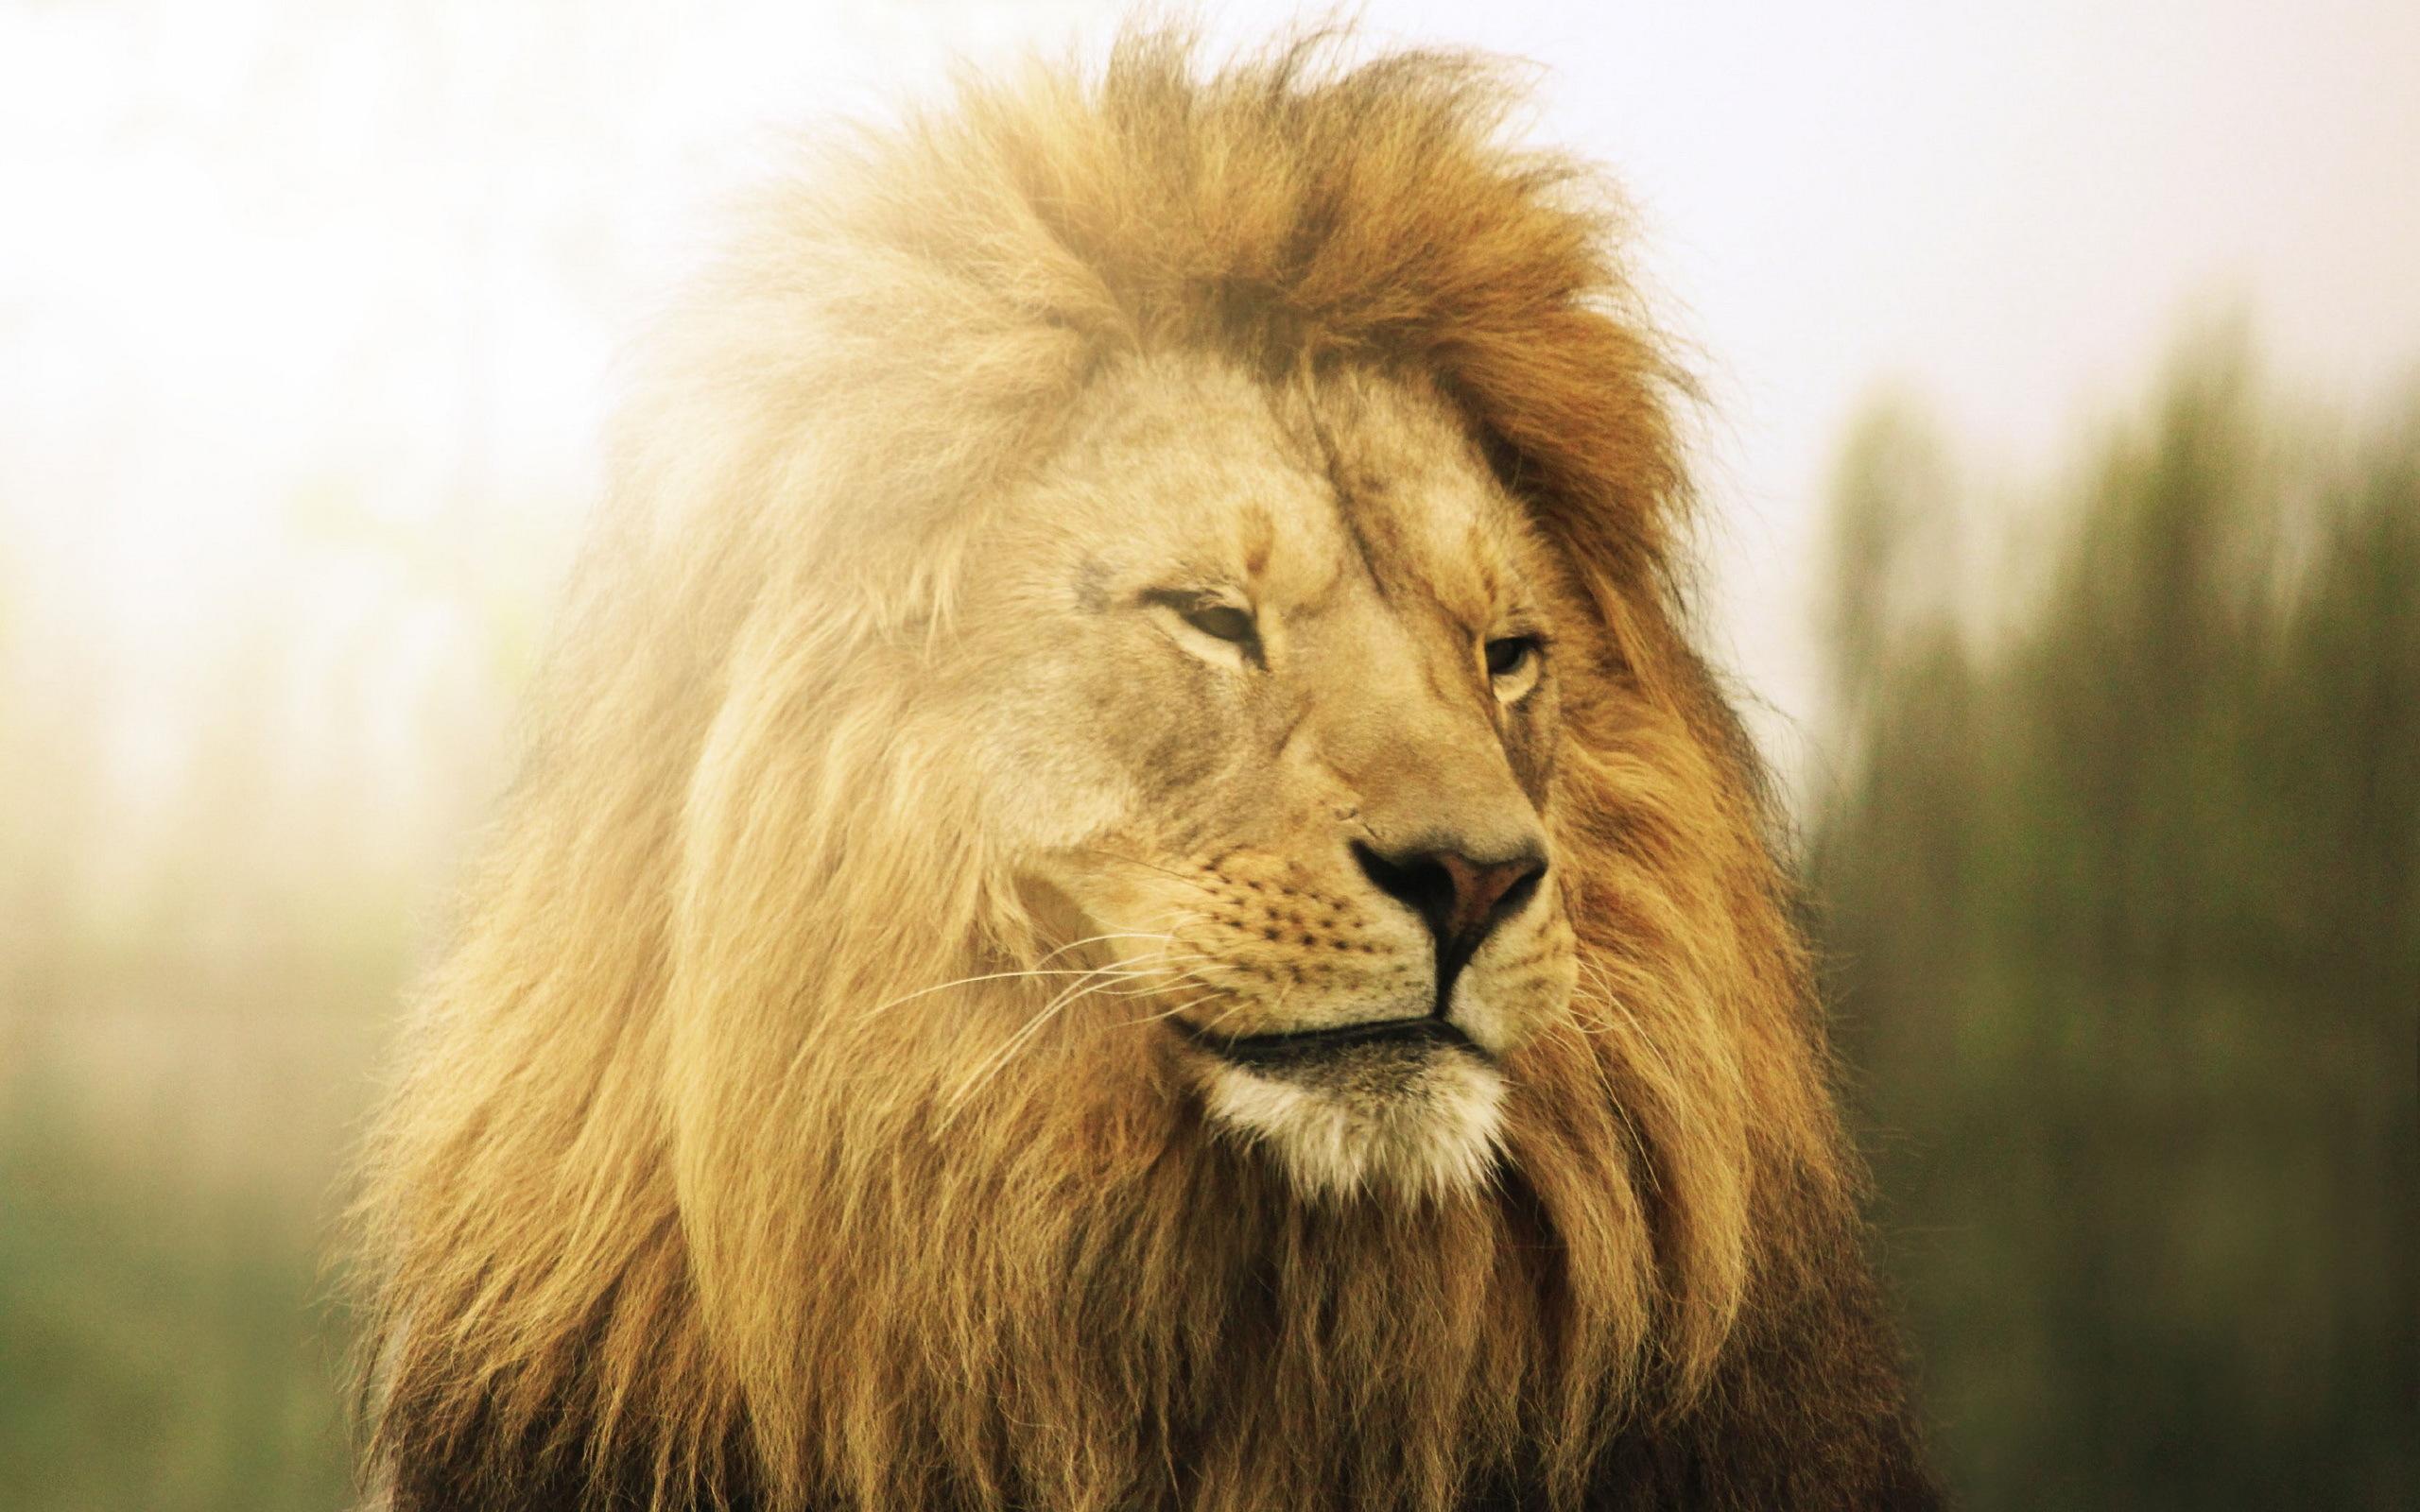 lion fonds d 39 cran arri res plan 2560x1600 id 414926. Black Bedroom Furniture Sets. Home Design Ideas